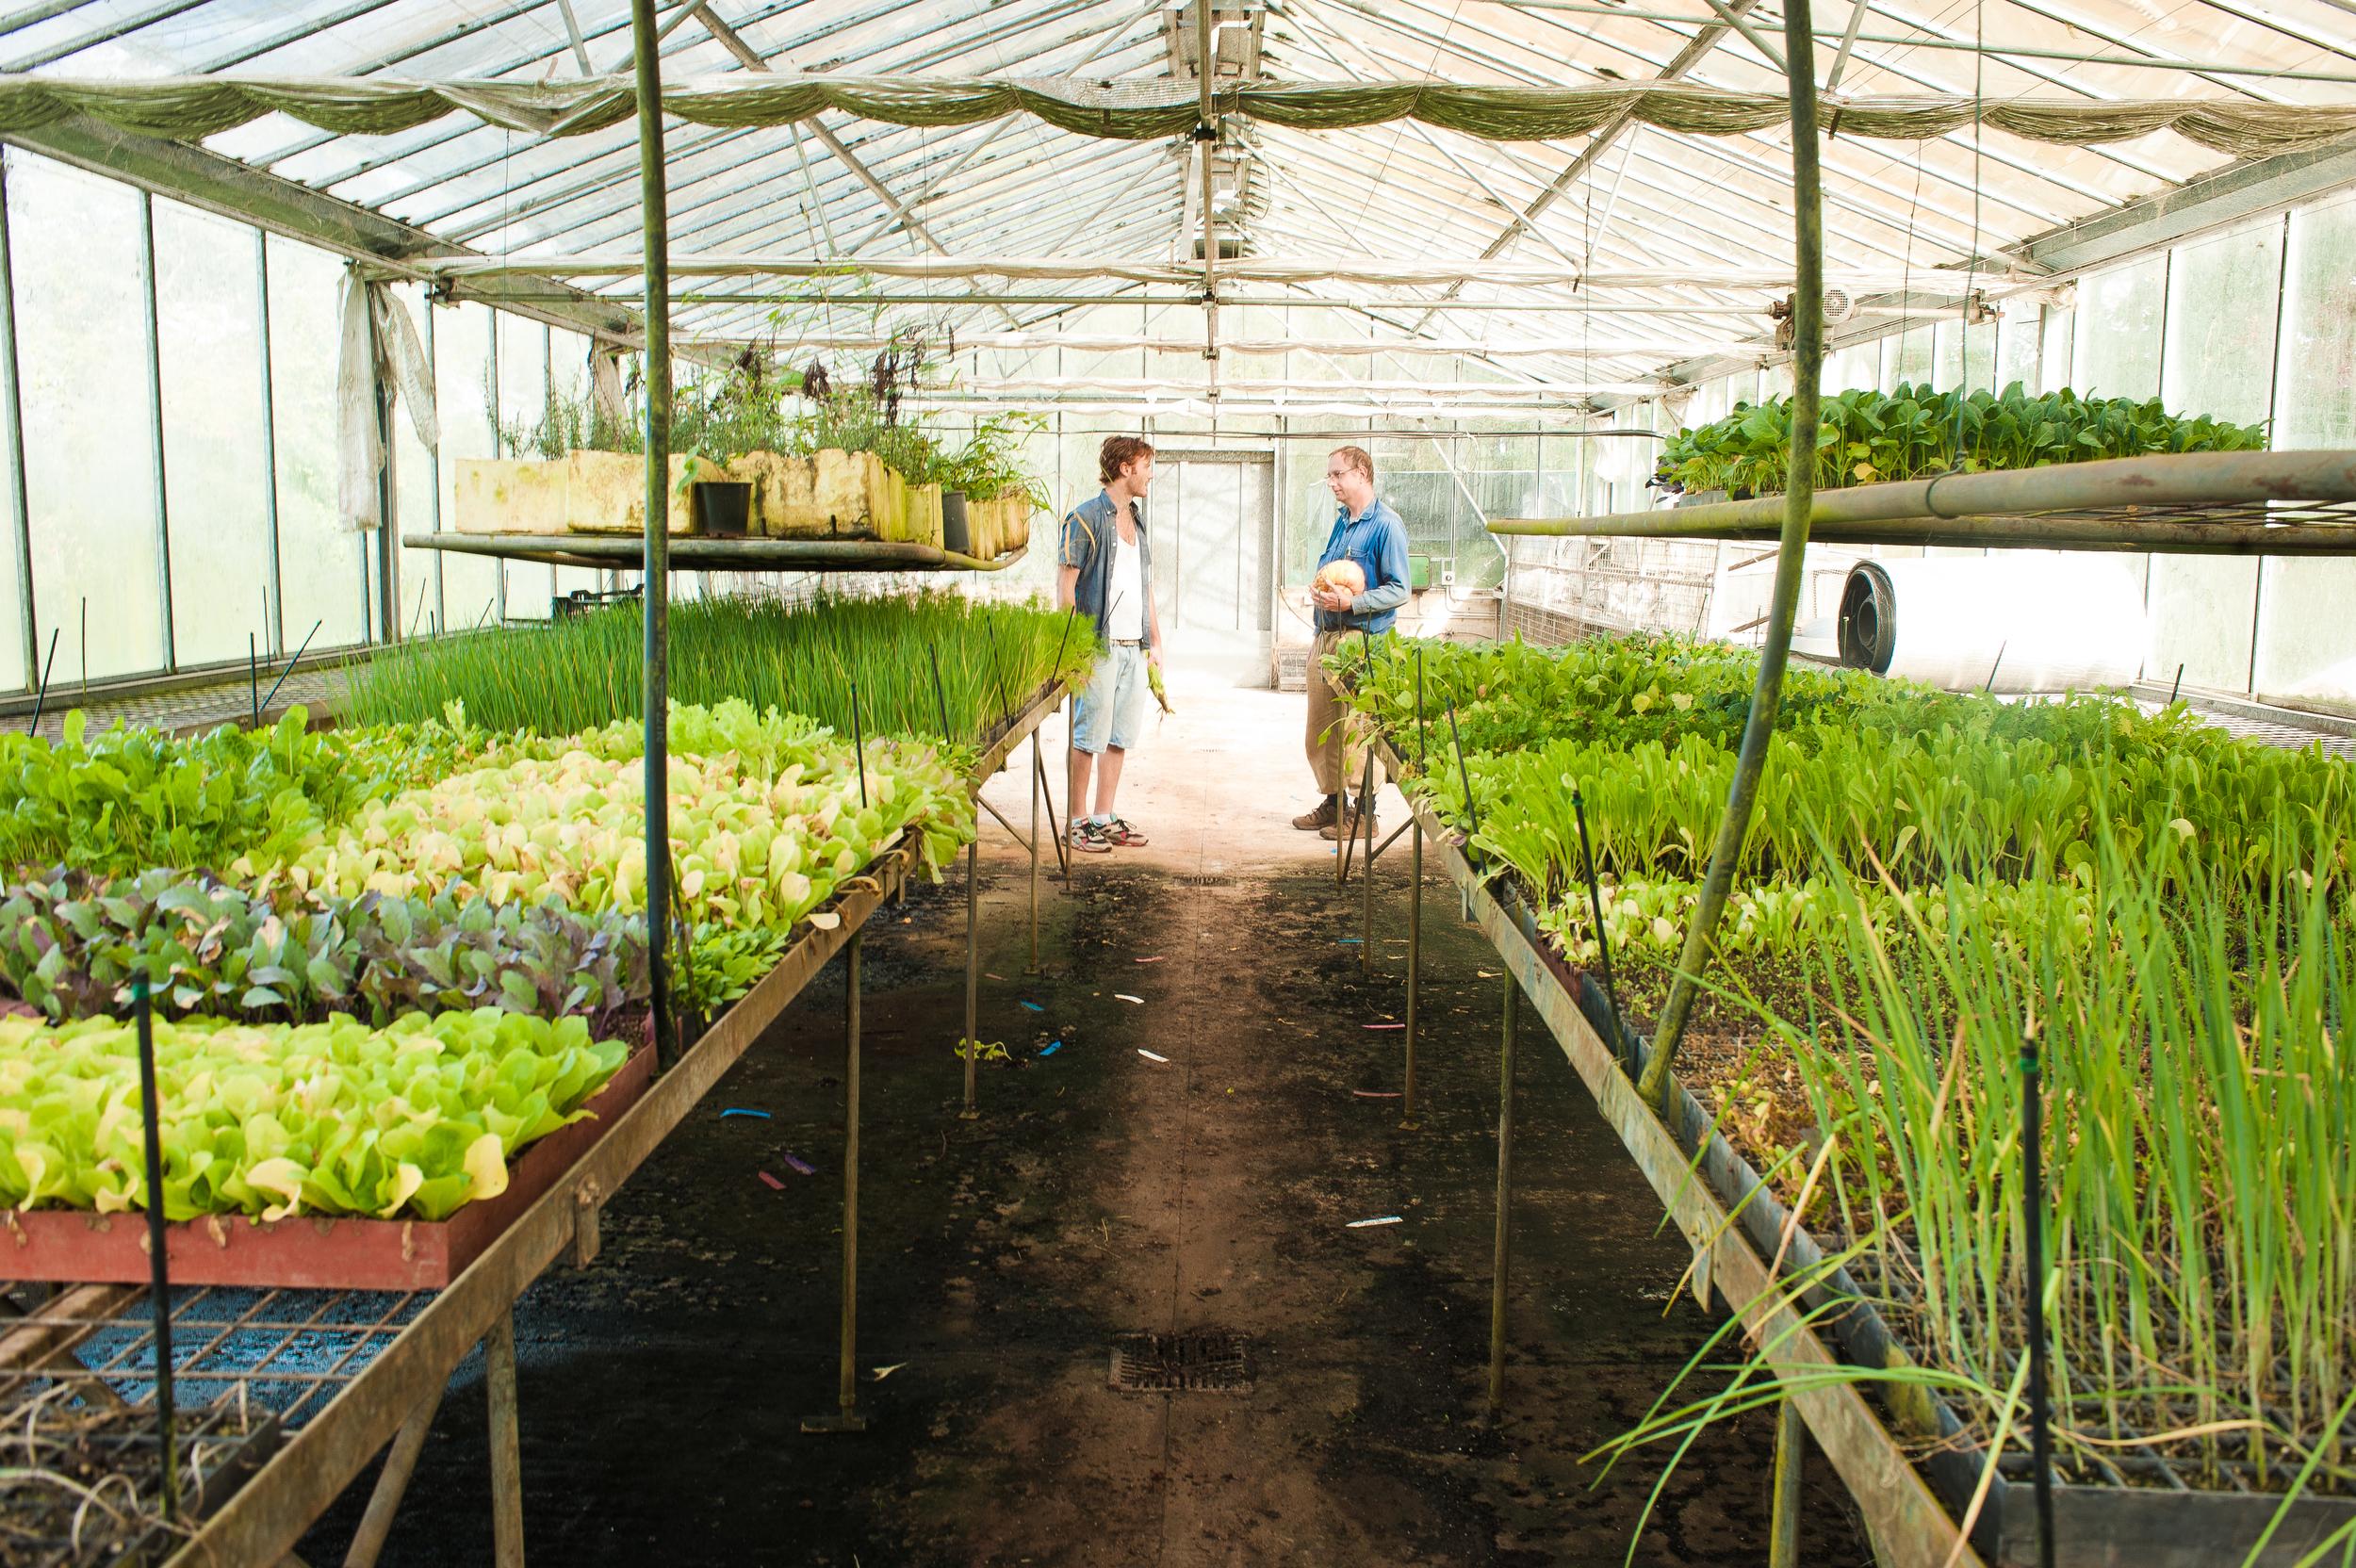 The Moonacre nursery greenhouse where creation begins.